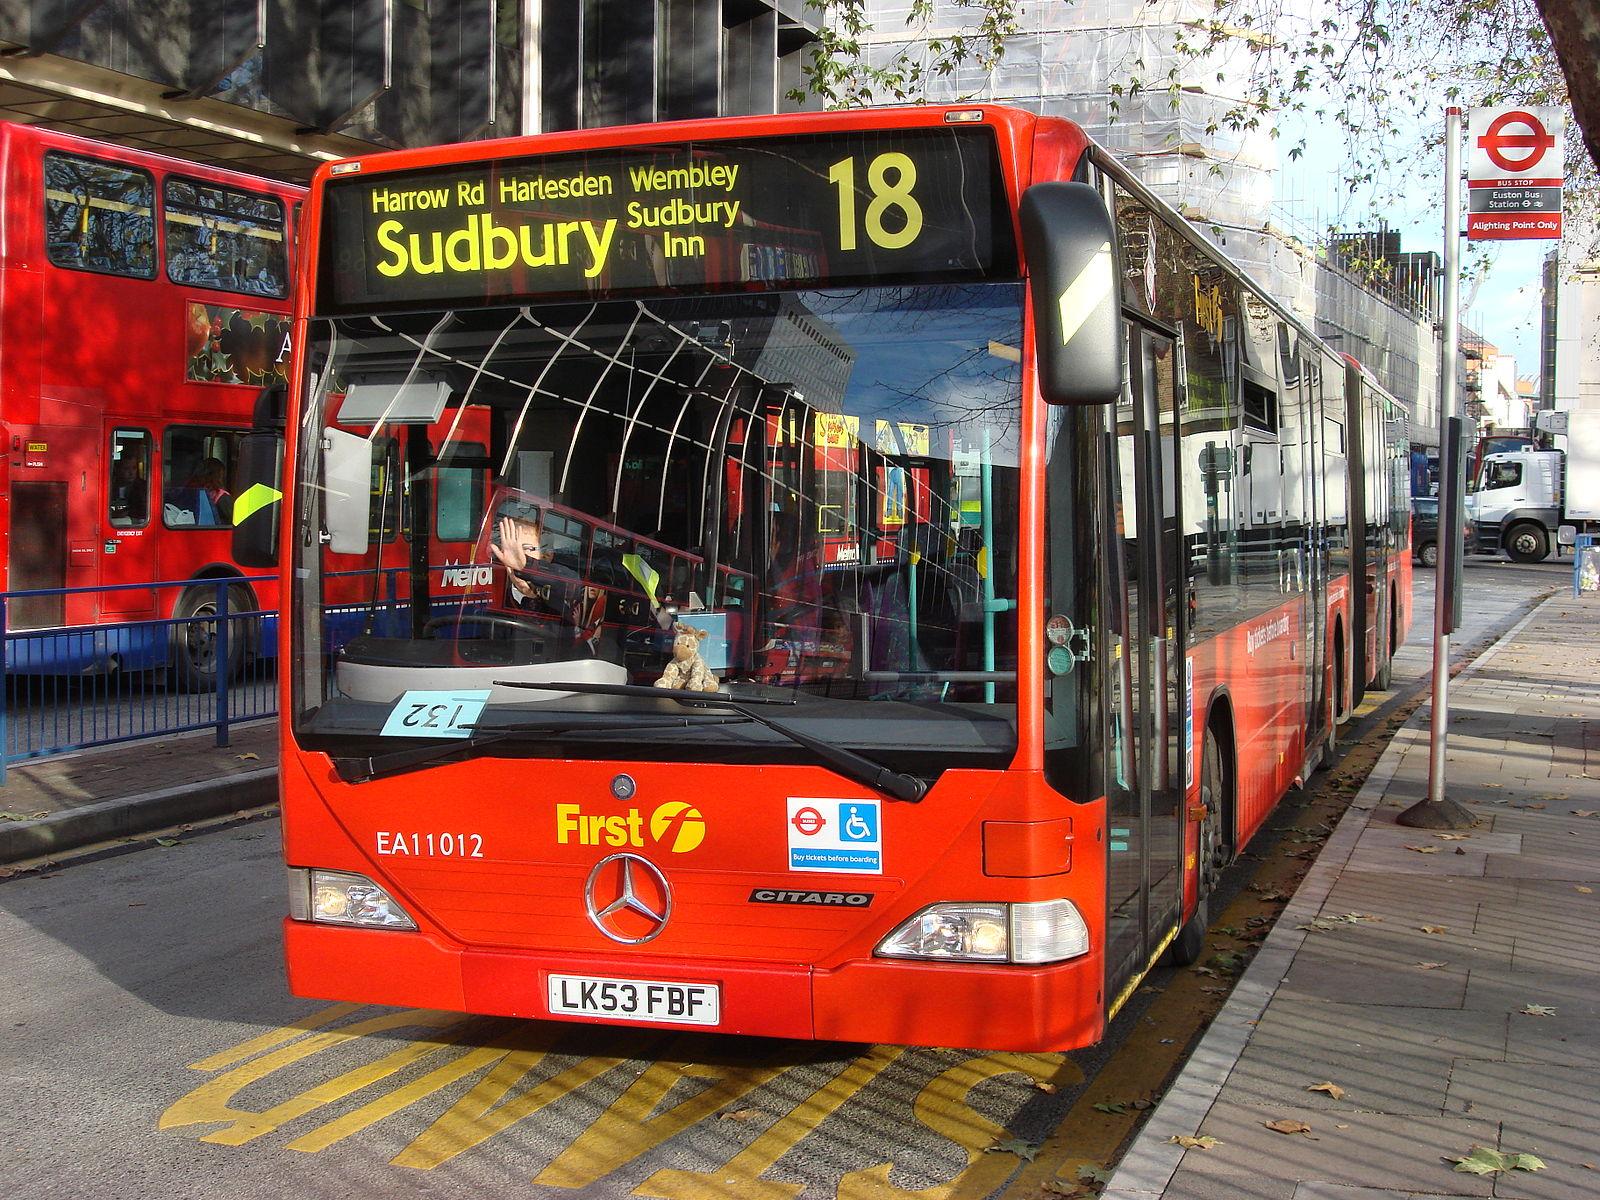 #AYearOfBuses 318: Euston – Sudbury